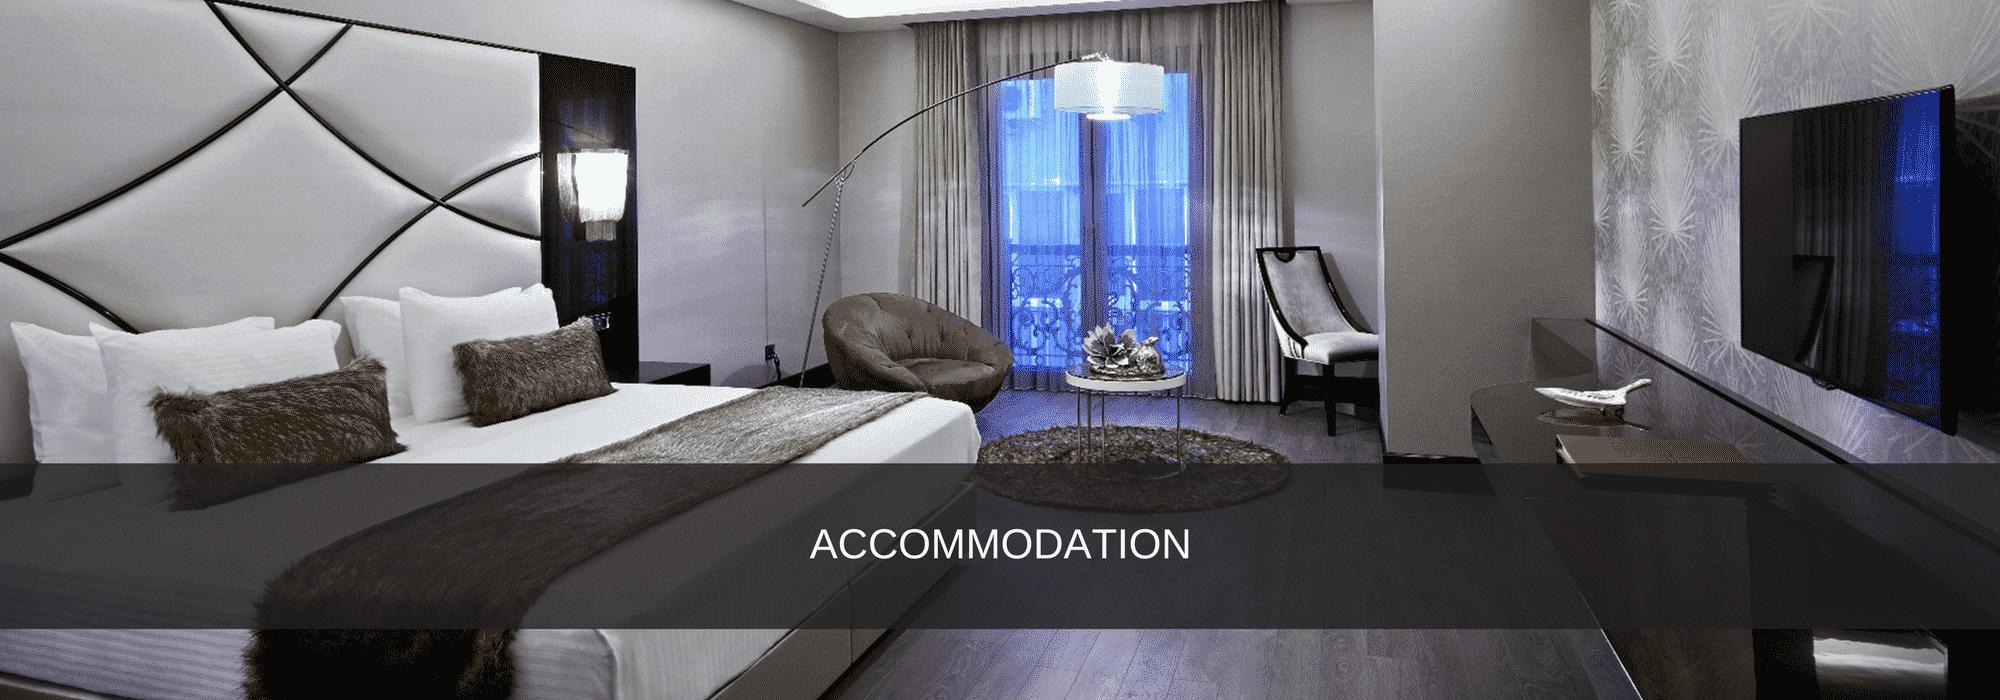 Accommodation FAQ - Global Medical Care